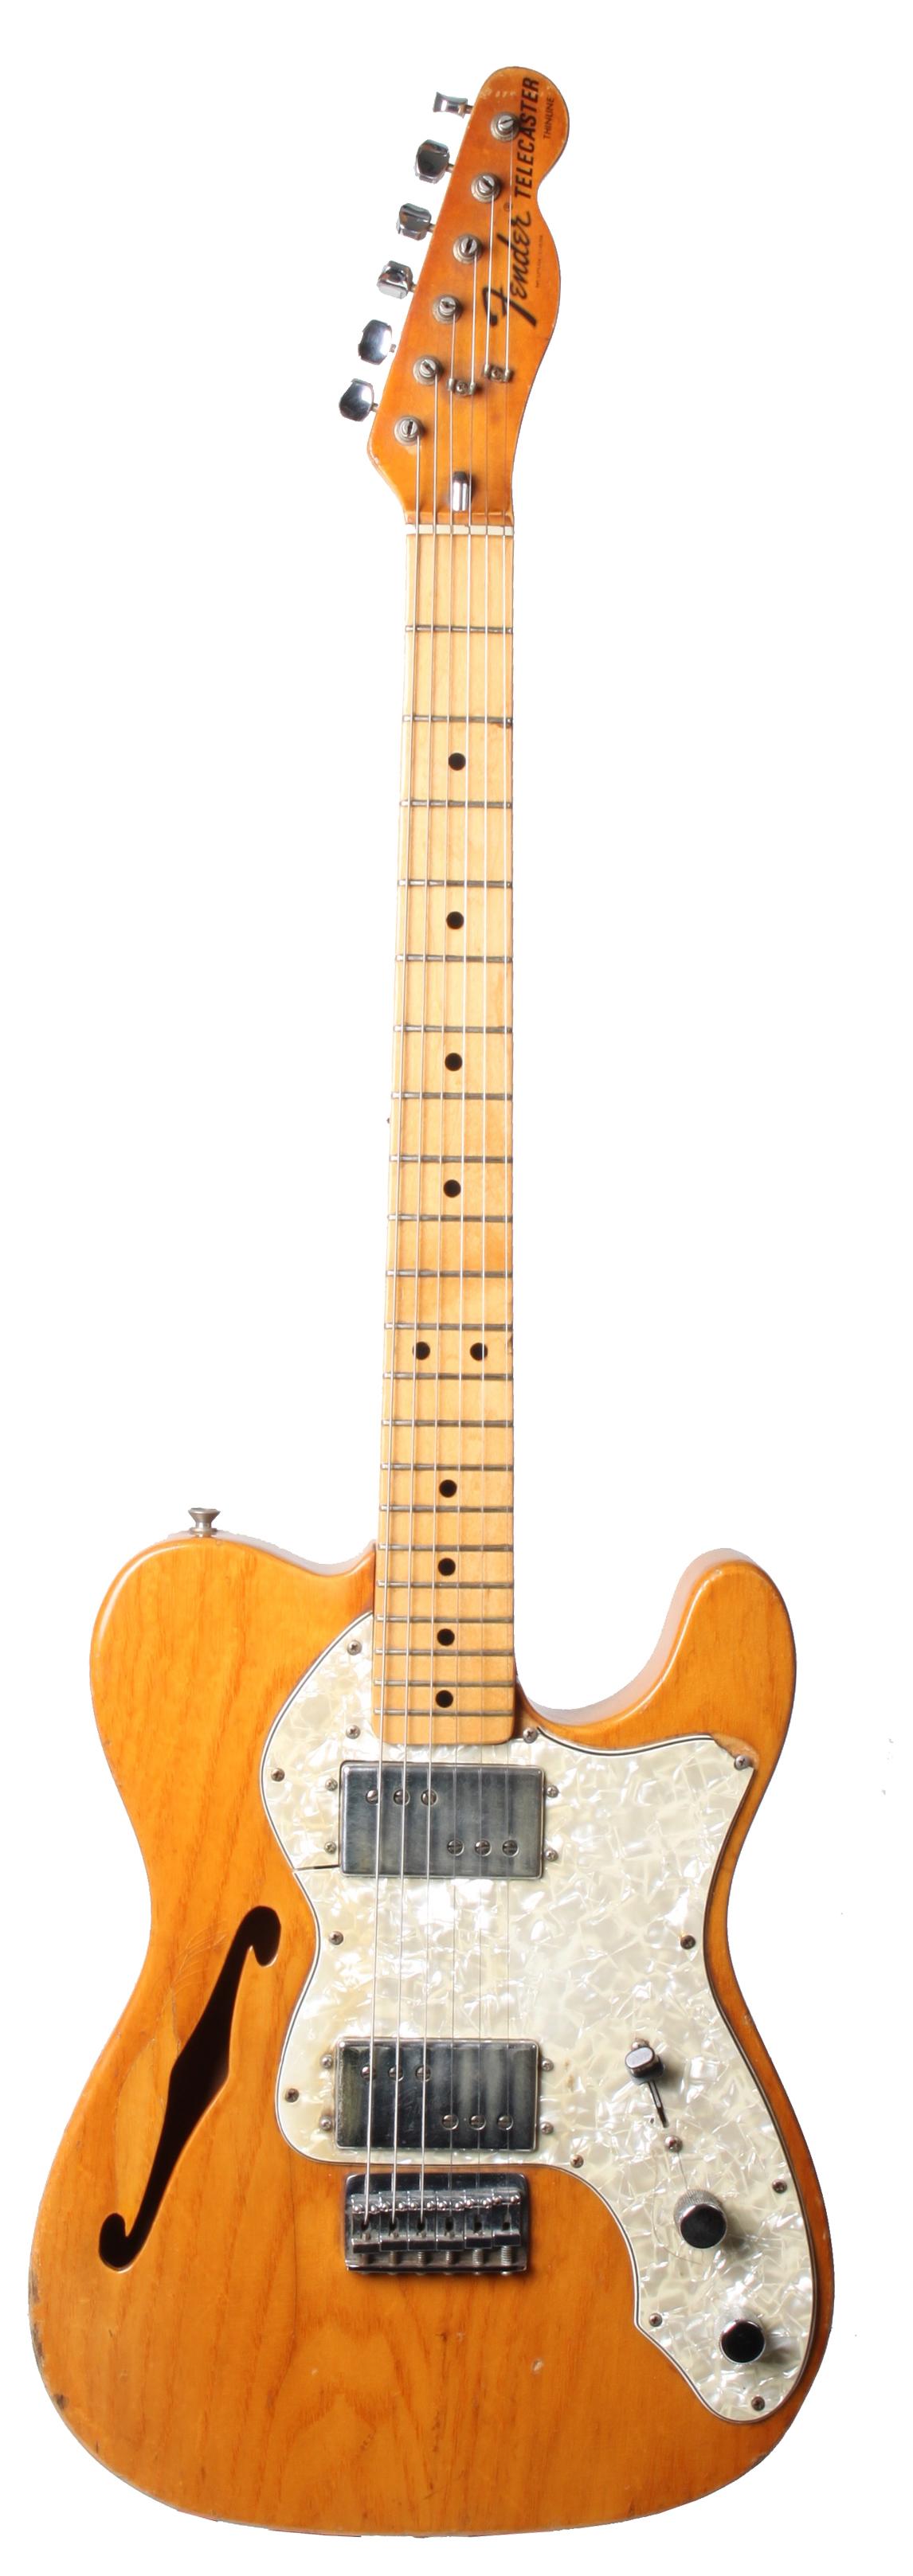 Fender Telecaster Thinline Natur a9837f2